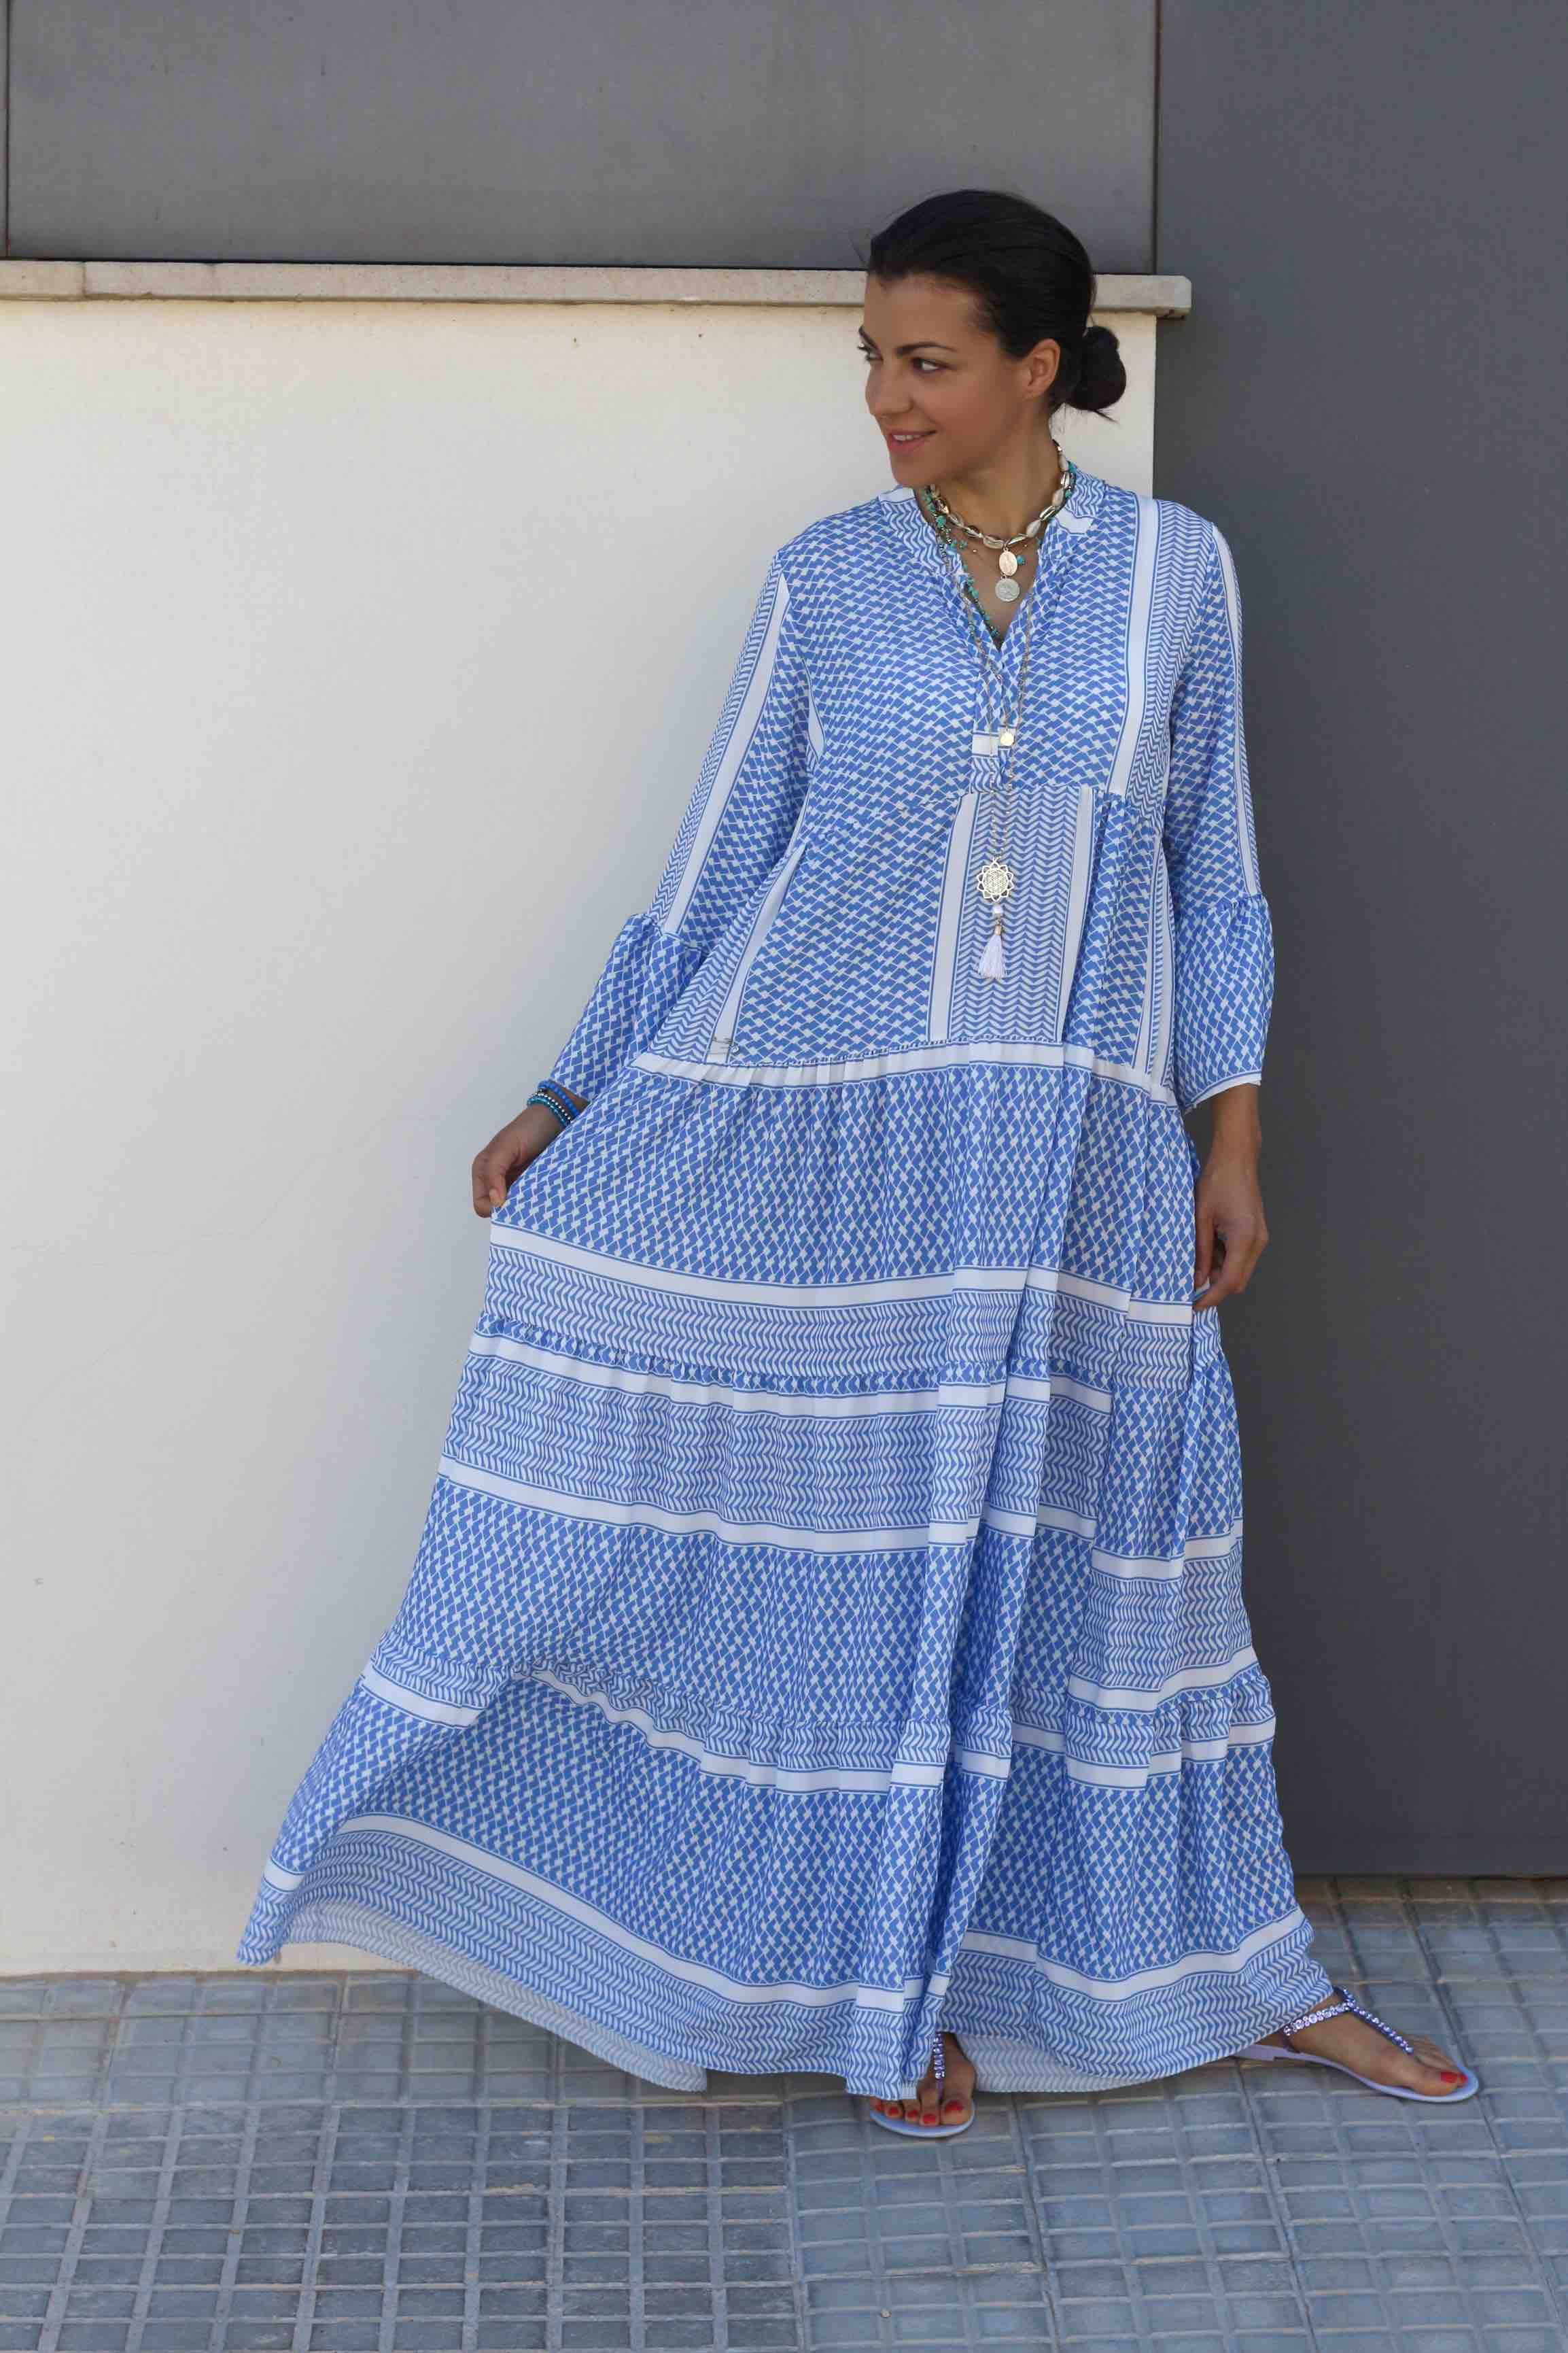 amelie kleid blau weiss maxi pali kleid | kleid blau weiß